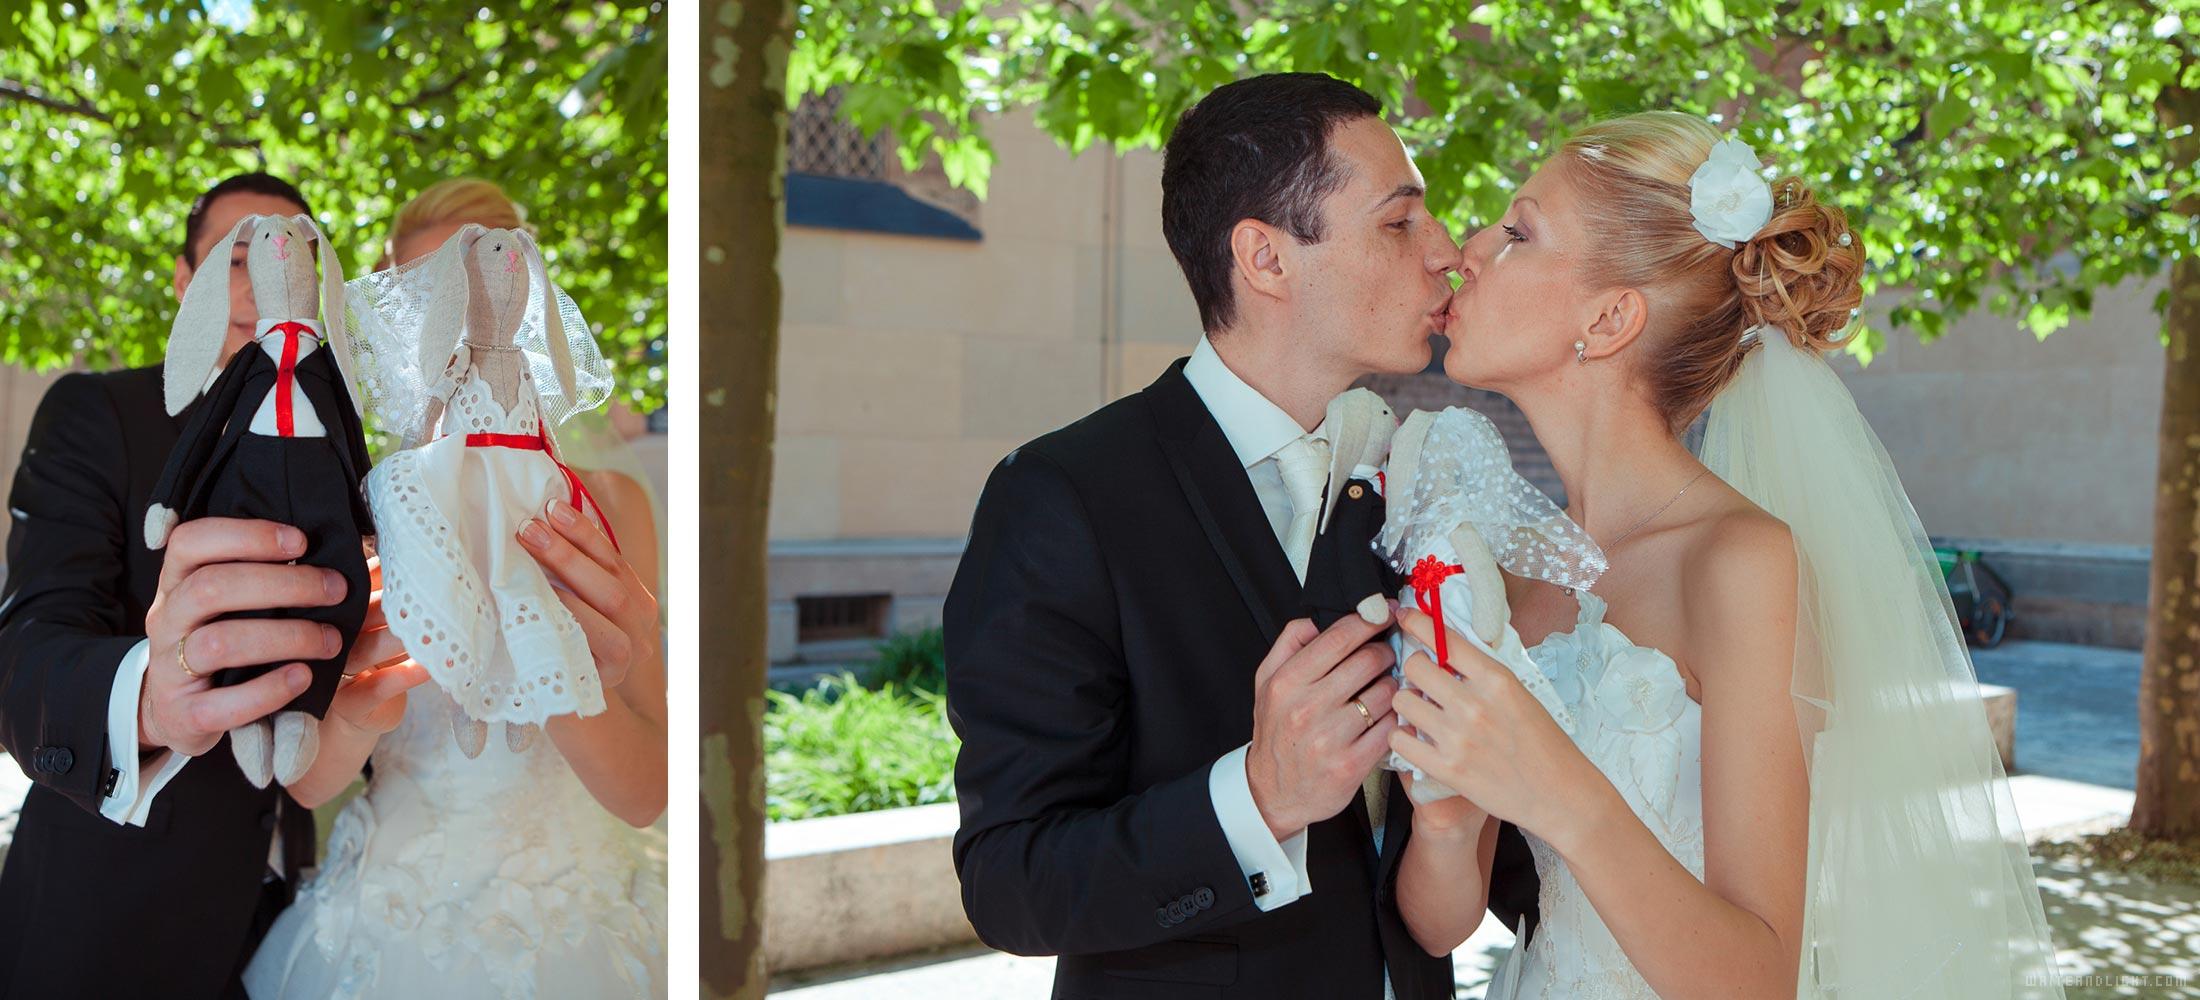 Wedding photographer Blog - weddingcards